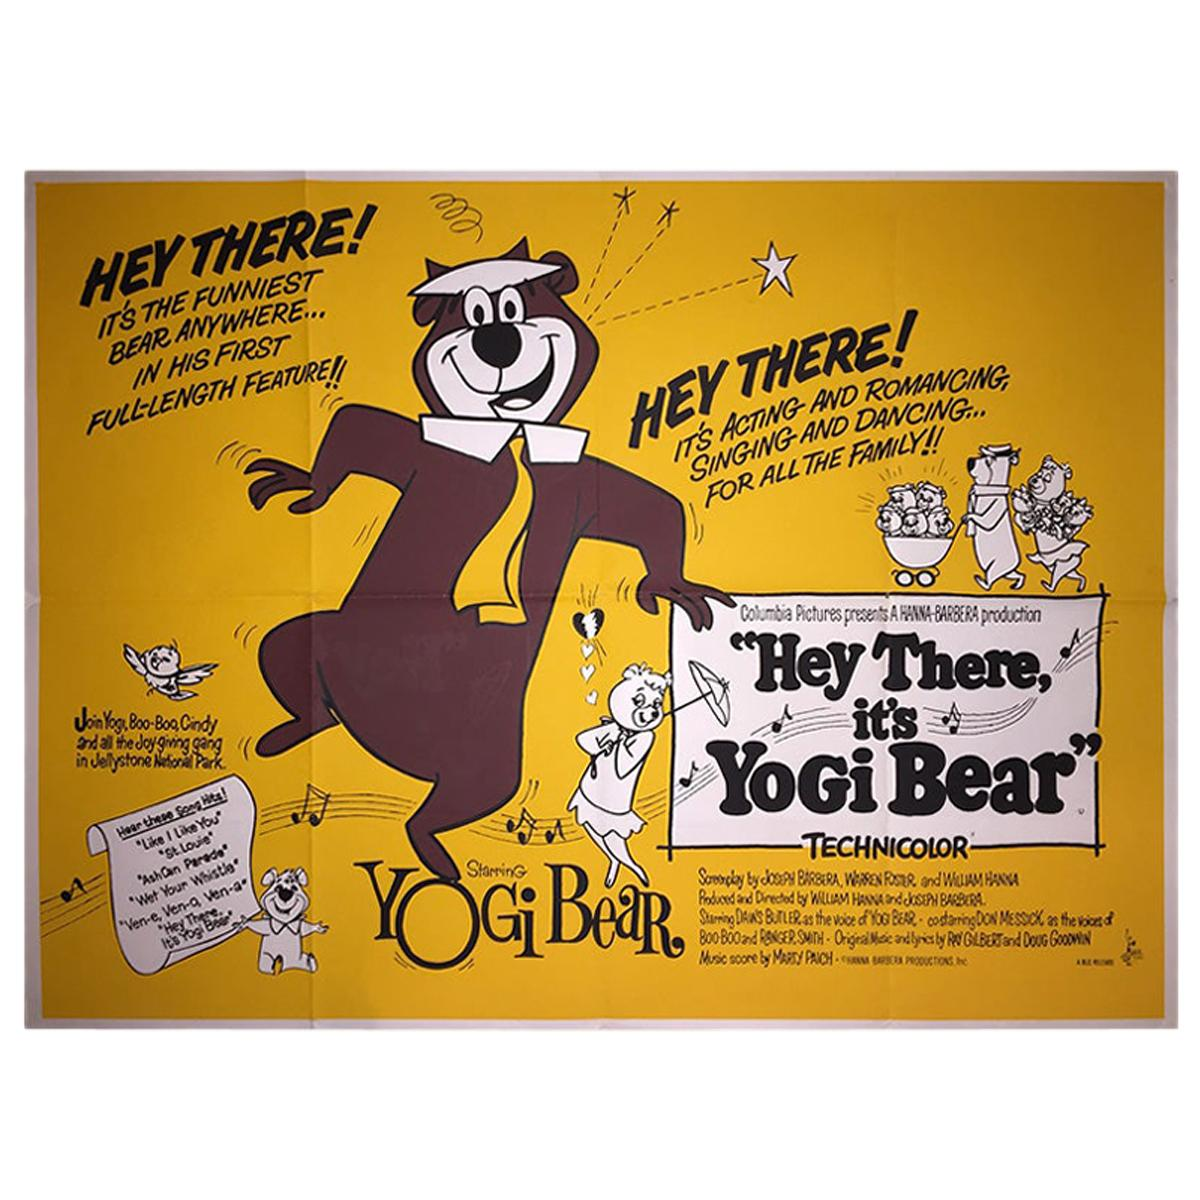 """Hey There, It's Yogi Bear"" '1964' Poster"